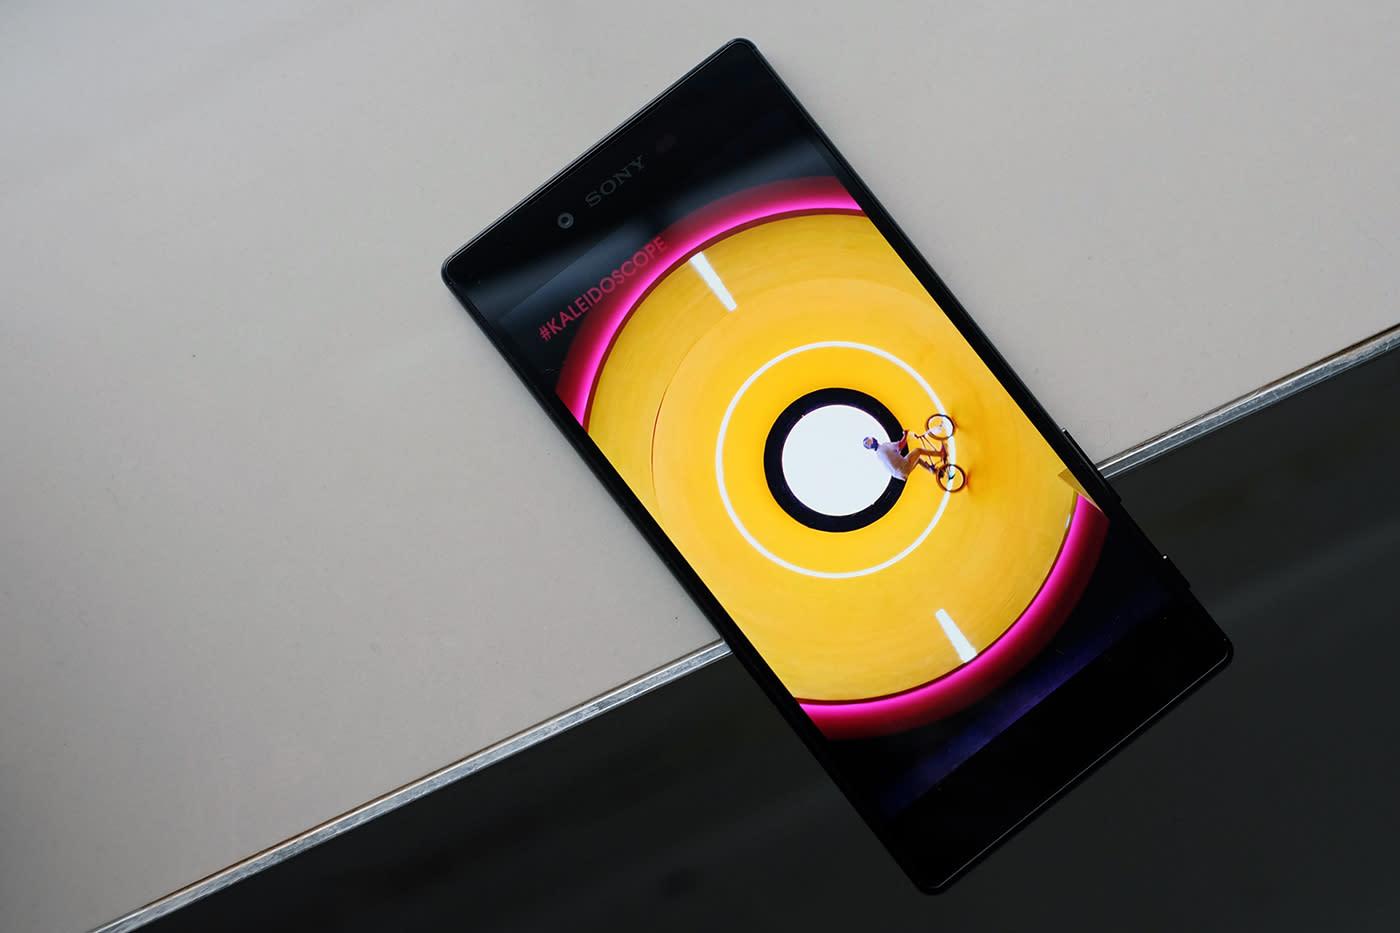 The Xperia Z5 Premium's UHD screen broke my heart